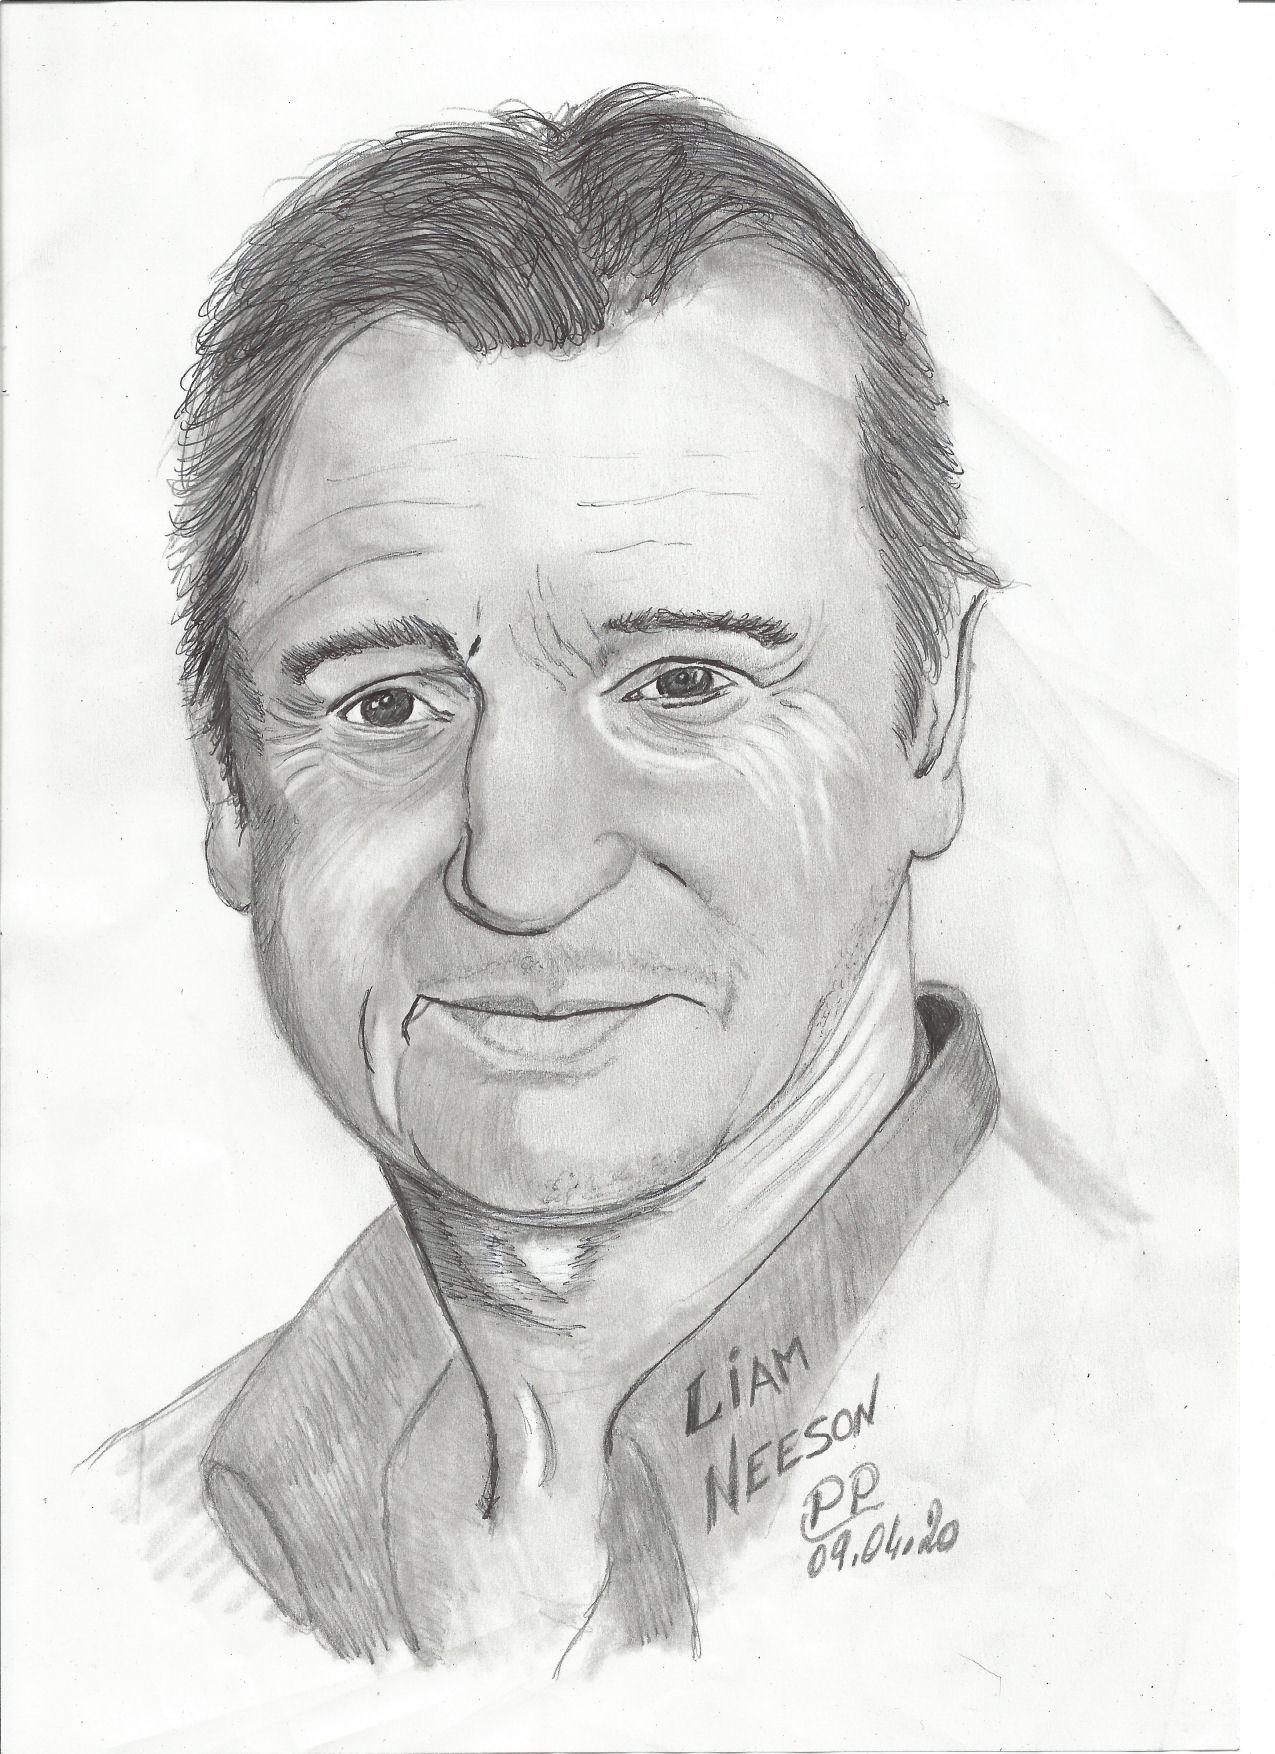 Dessin Liam Neeson de Patoux